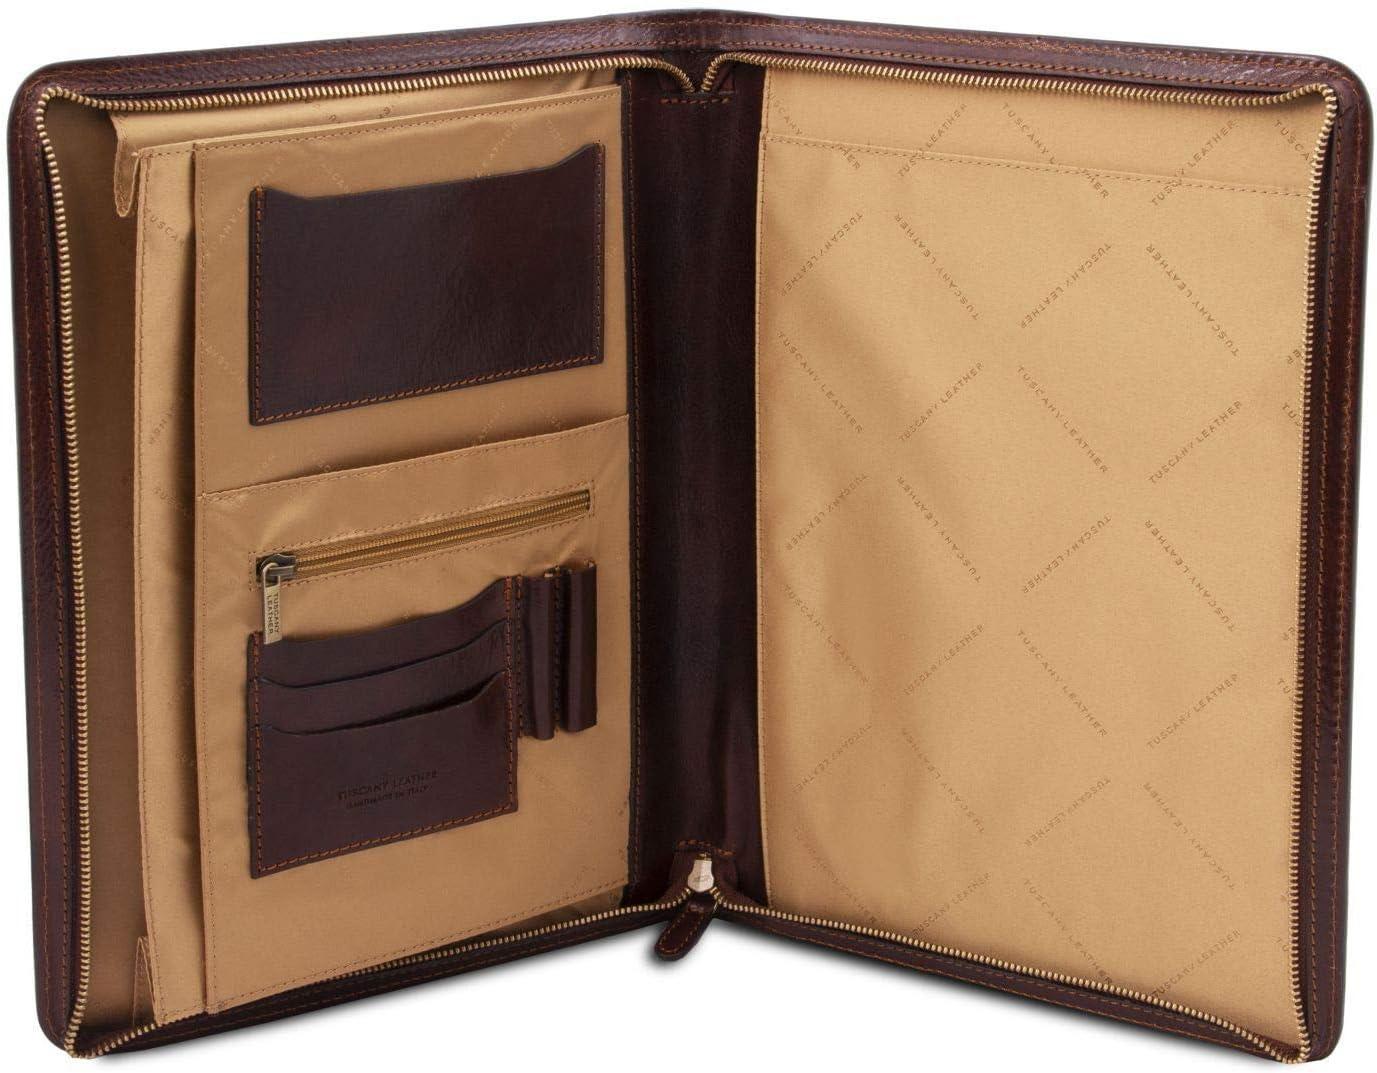 Tuscany Leather Ottavio Klassische Dokumentenmappe aus Leder Braun